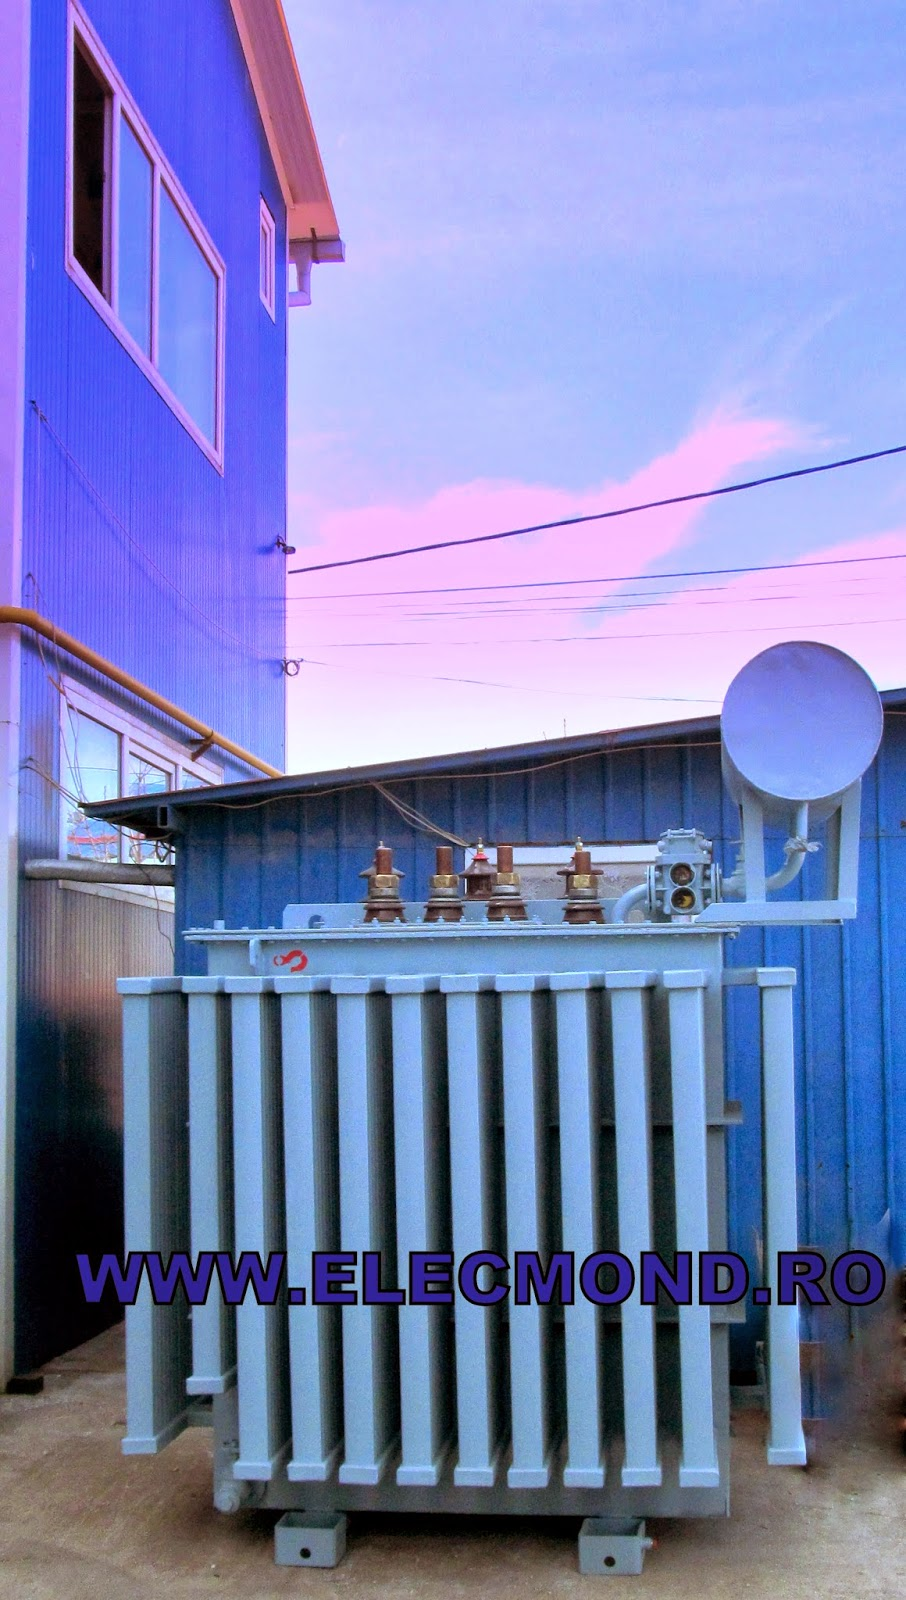 Transformatoare , transformator 1000 kVA transformator 1600 kVA , transformatoare de putere , fabrica transformatoare , reparatii transformatoare , transformator 400 kVA , trafo 1000 , trafo 1600 , trafo 400 kVA , transformator 400 kVA, elecmond  ,